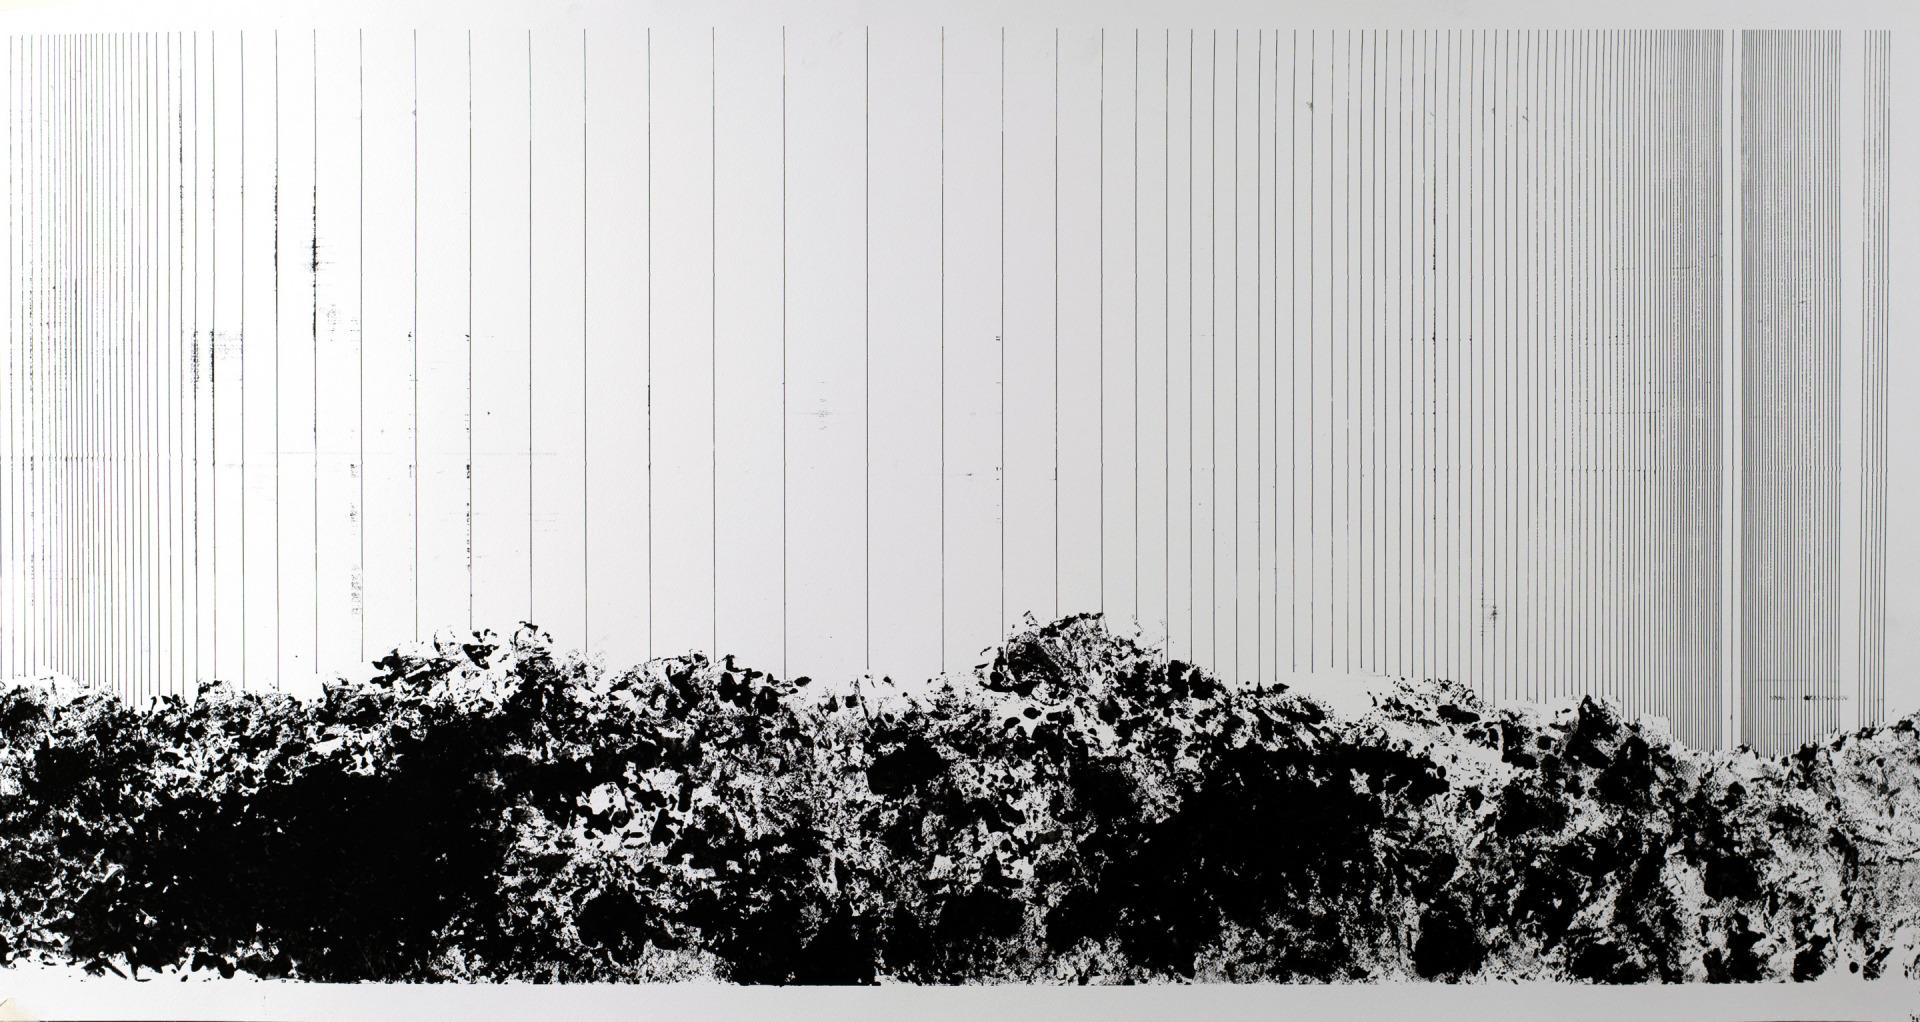 Contemporary art from Gyula Sági | op120521. 3